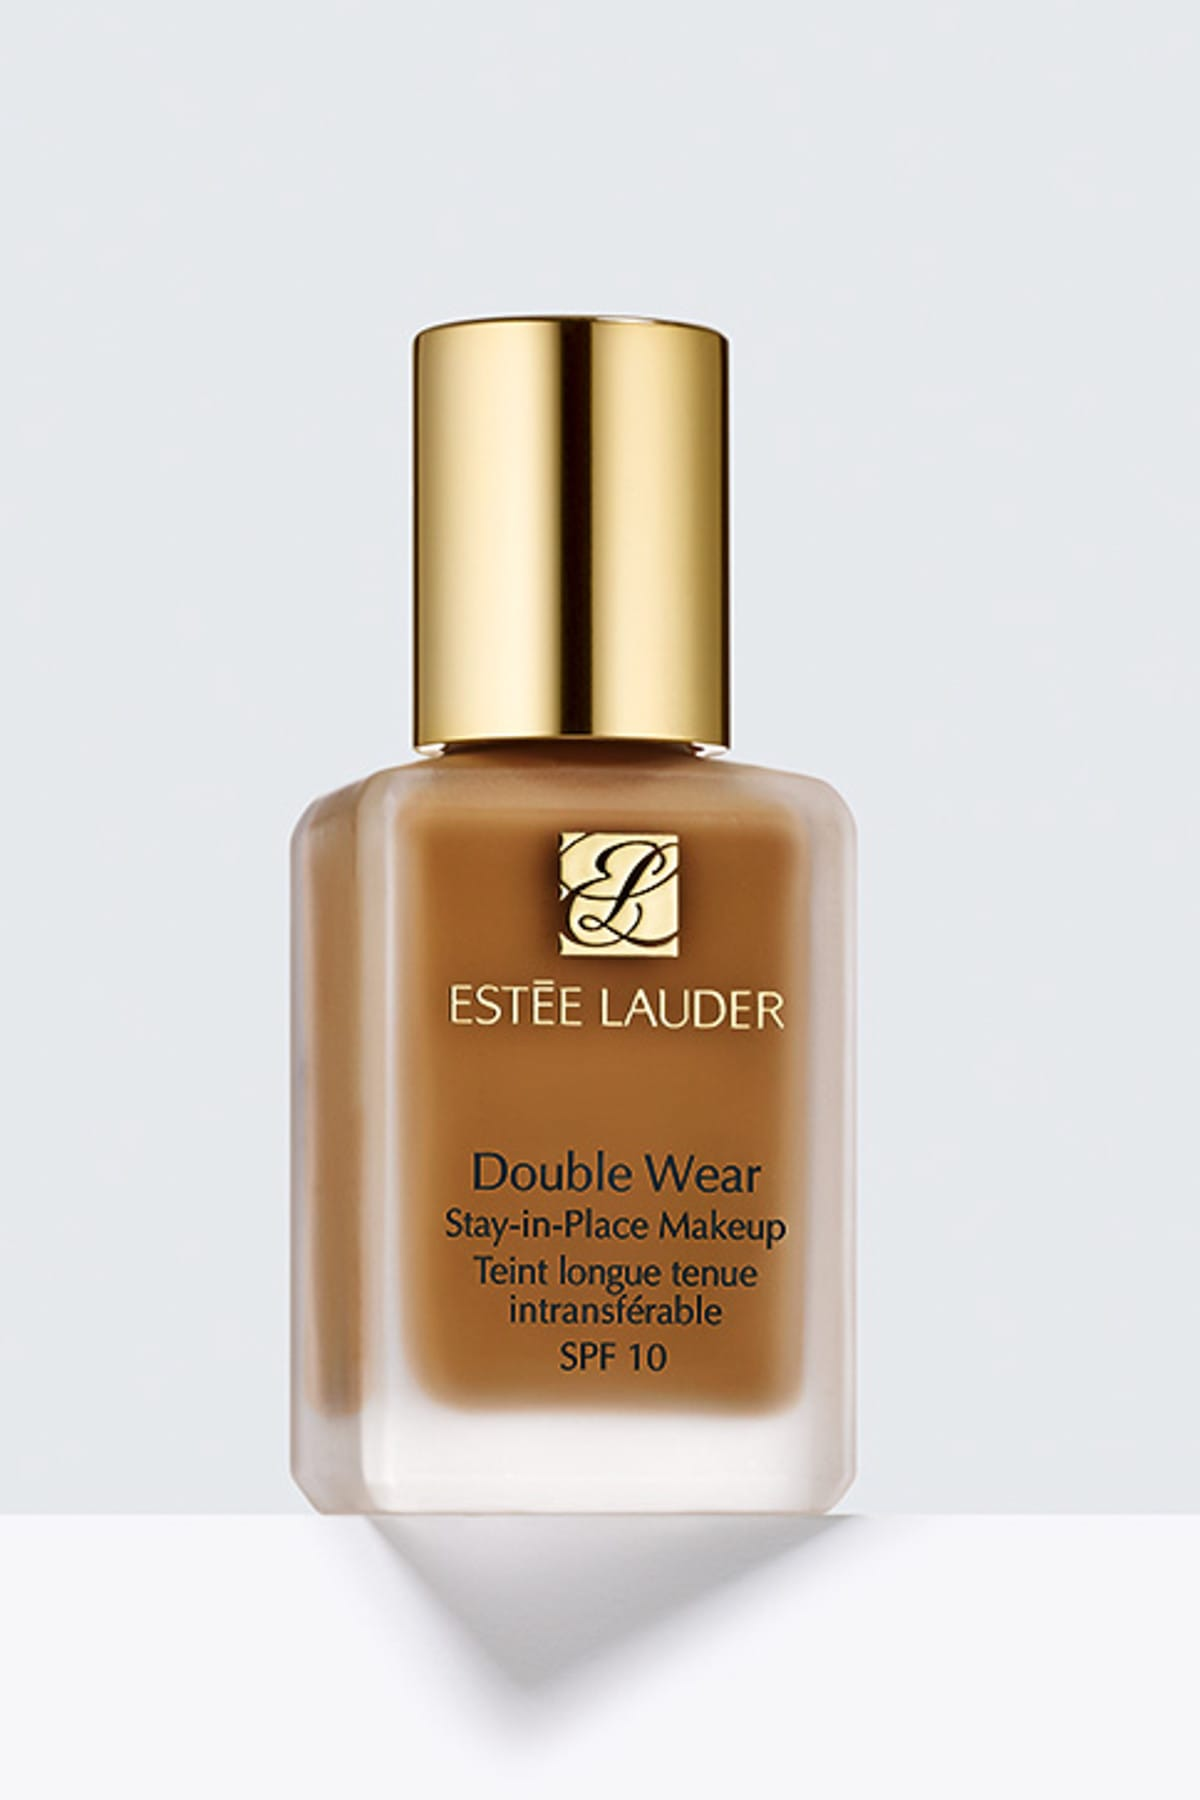 Estee Lauder Fondöten - Double Wear Foundation S.I.P Spf10 6W1 Sandalwood30 ml027131978138 1